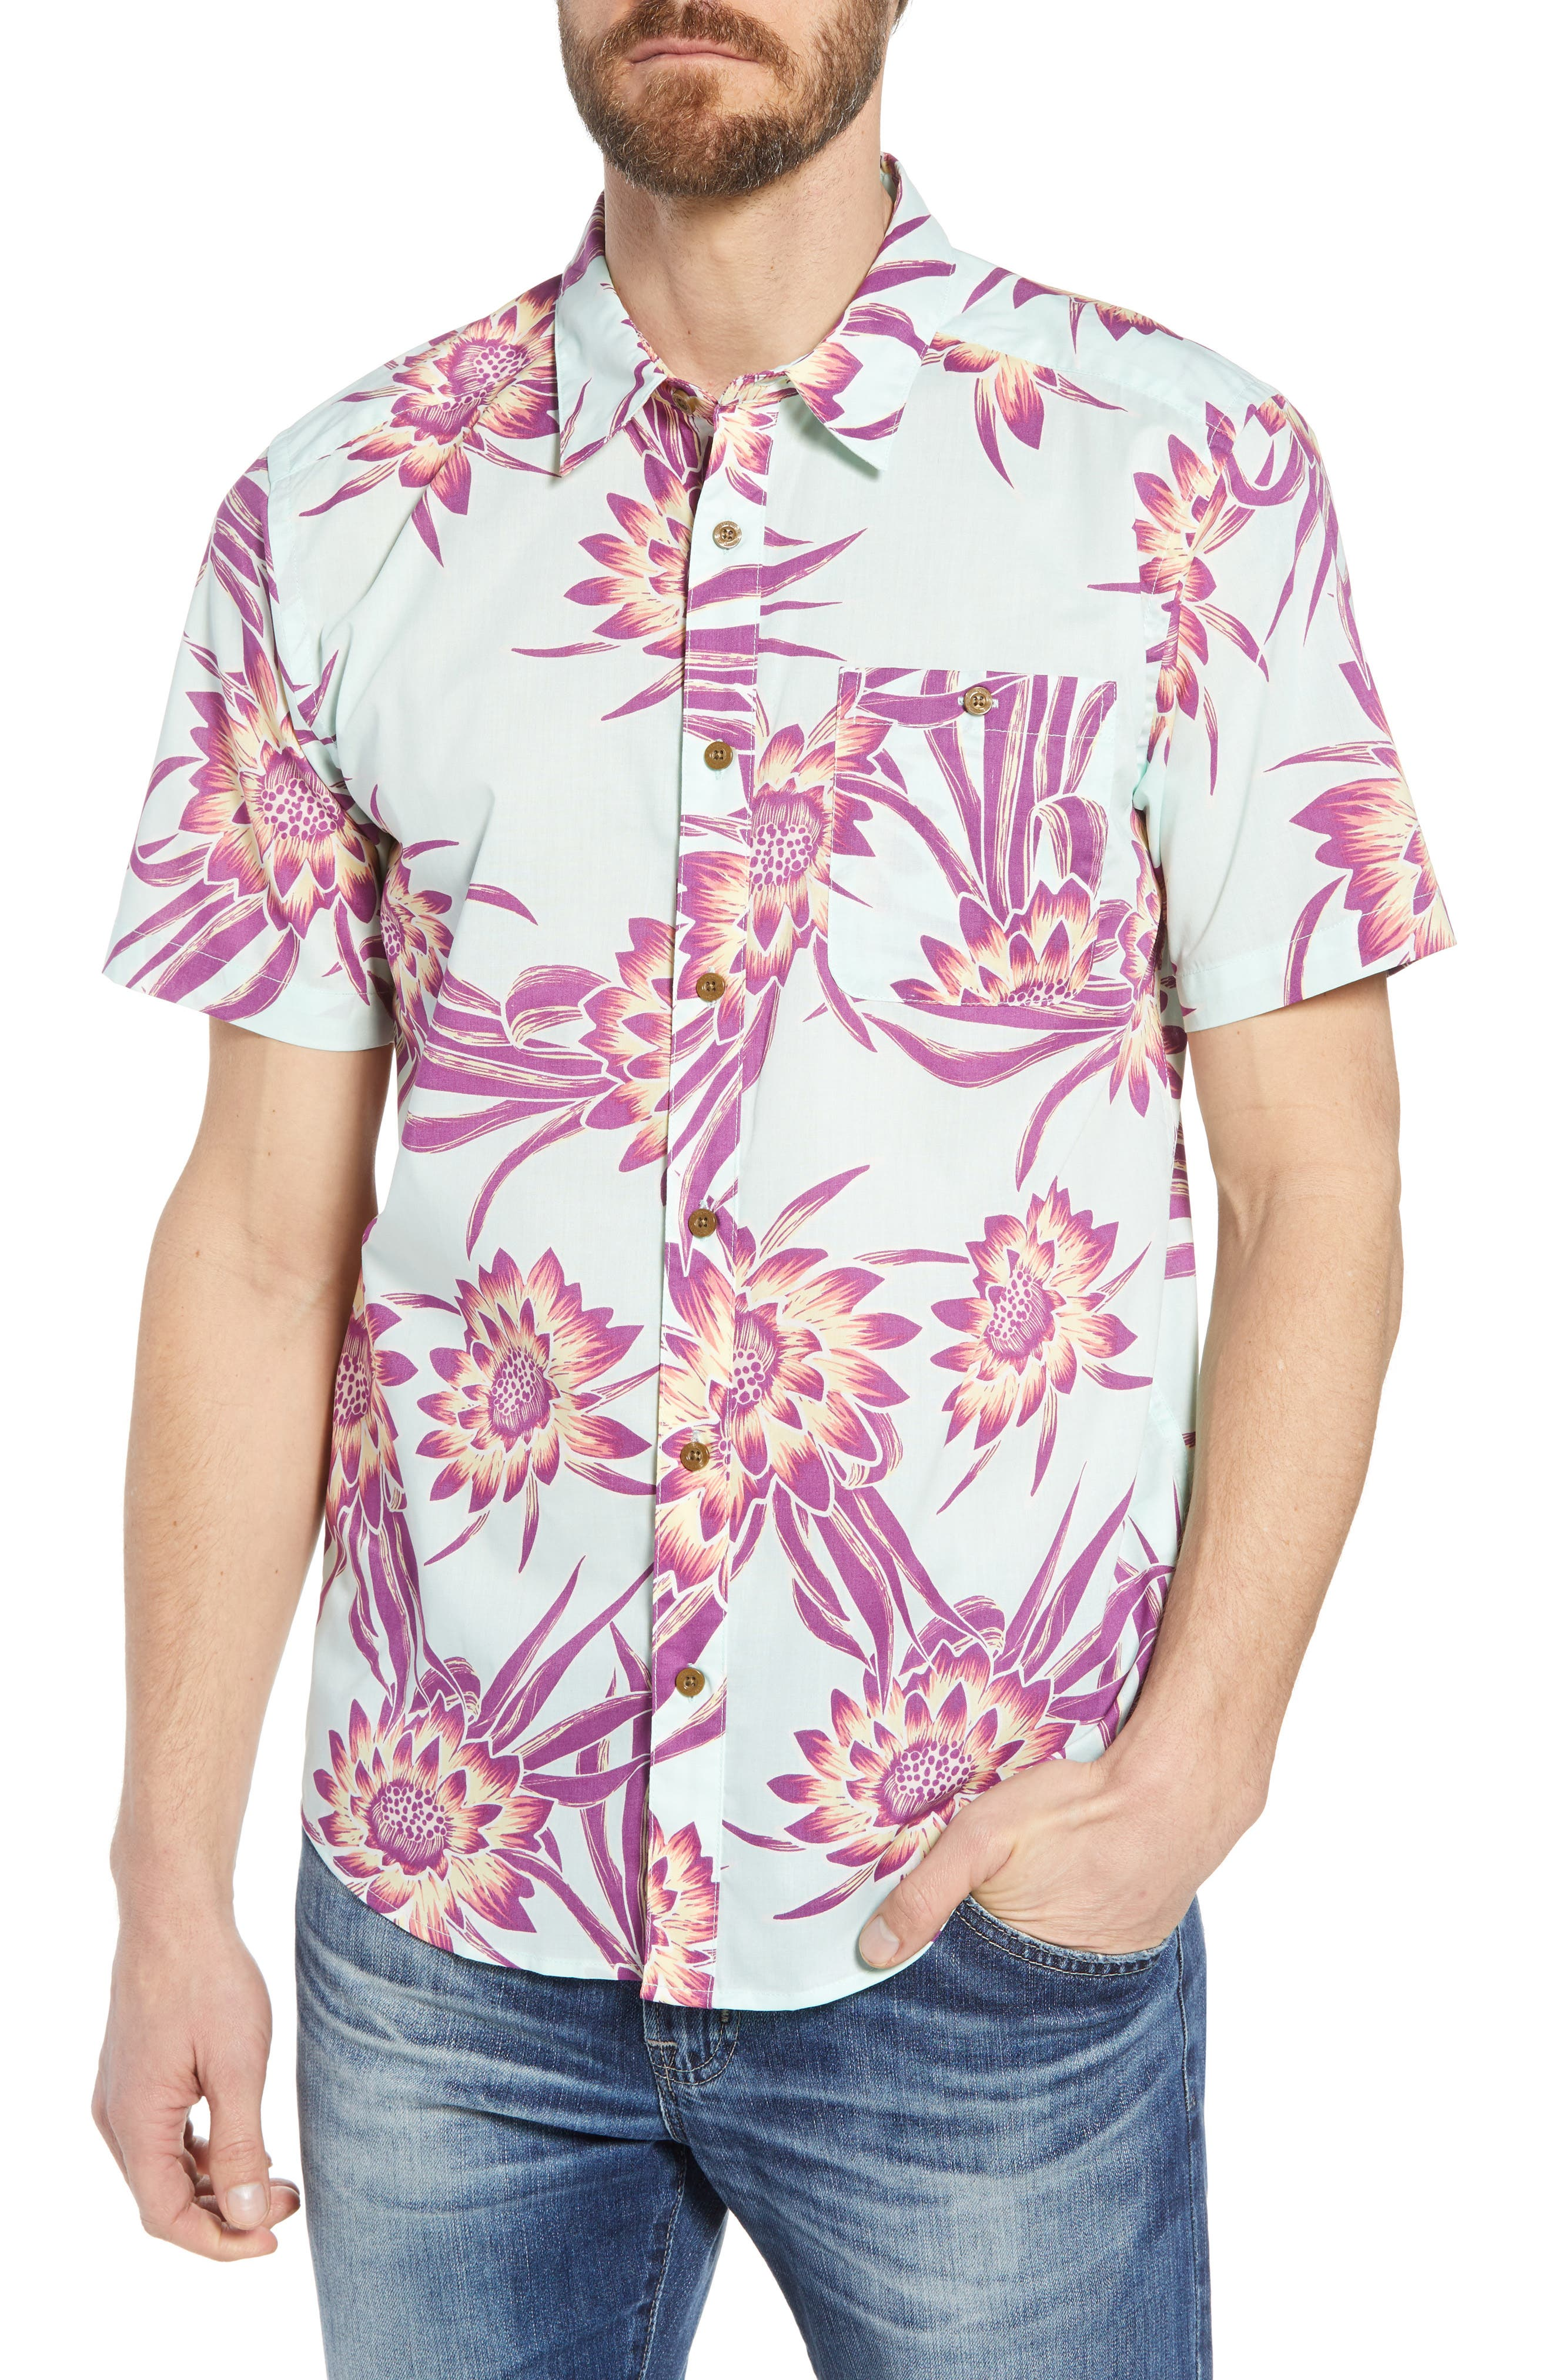 'Go To' Slim Fit Short Sleeve Sport Shirt,                         Main,                         color, Cereus Flower/ Lite Bend Blue